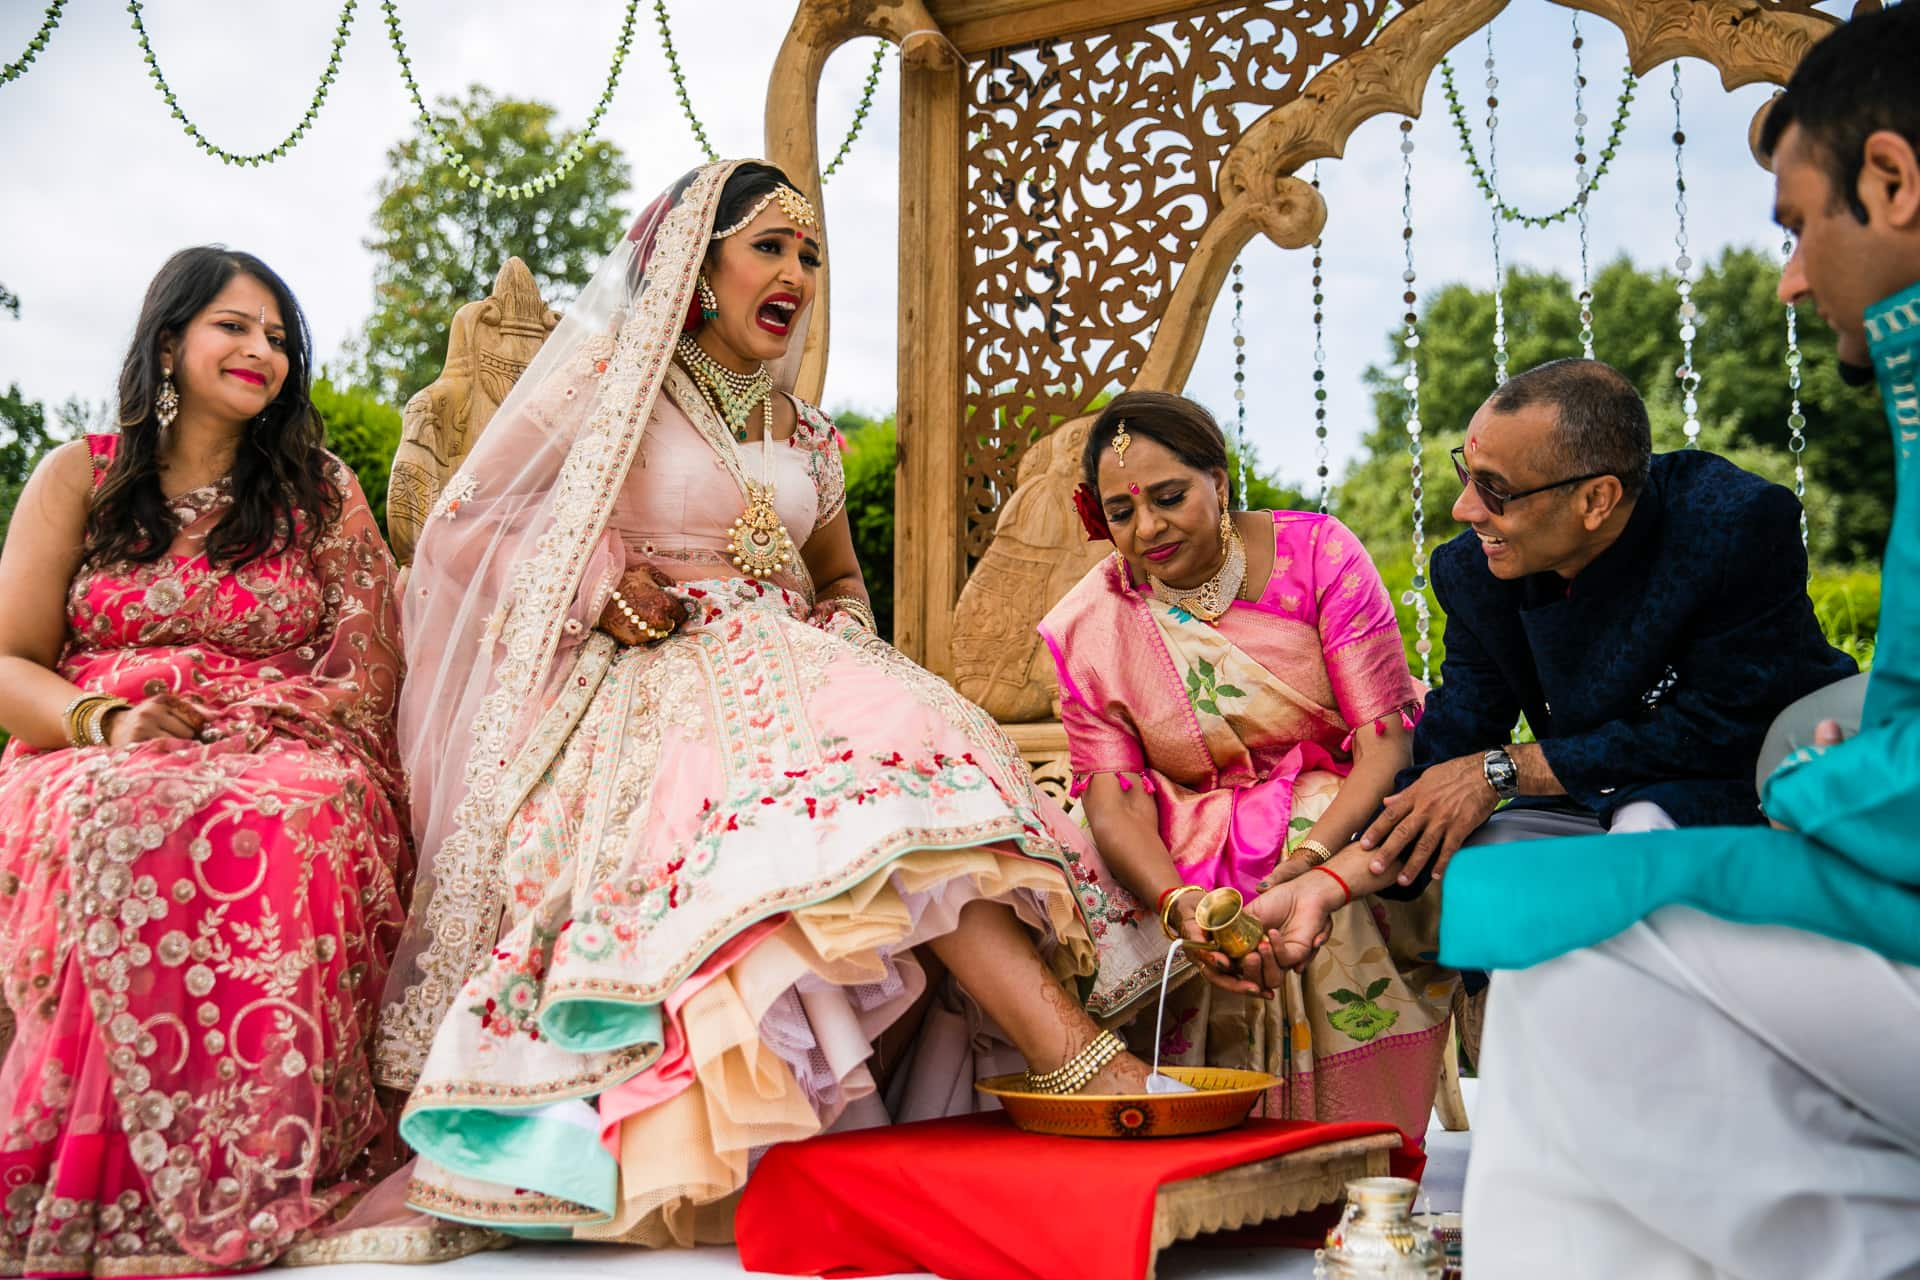 Feet washing ceremony during Gujarati wedding